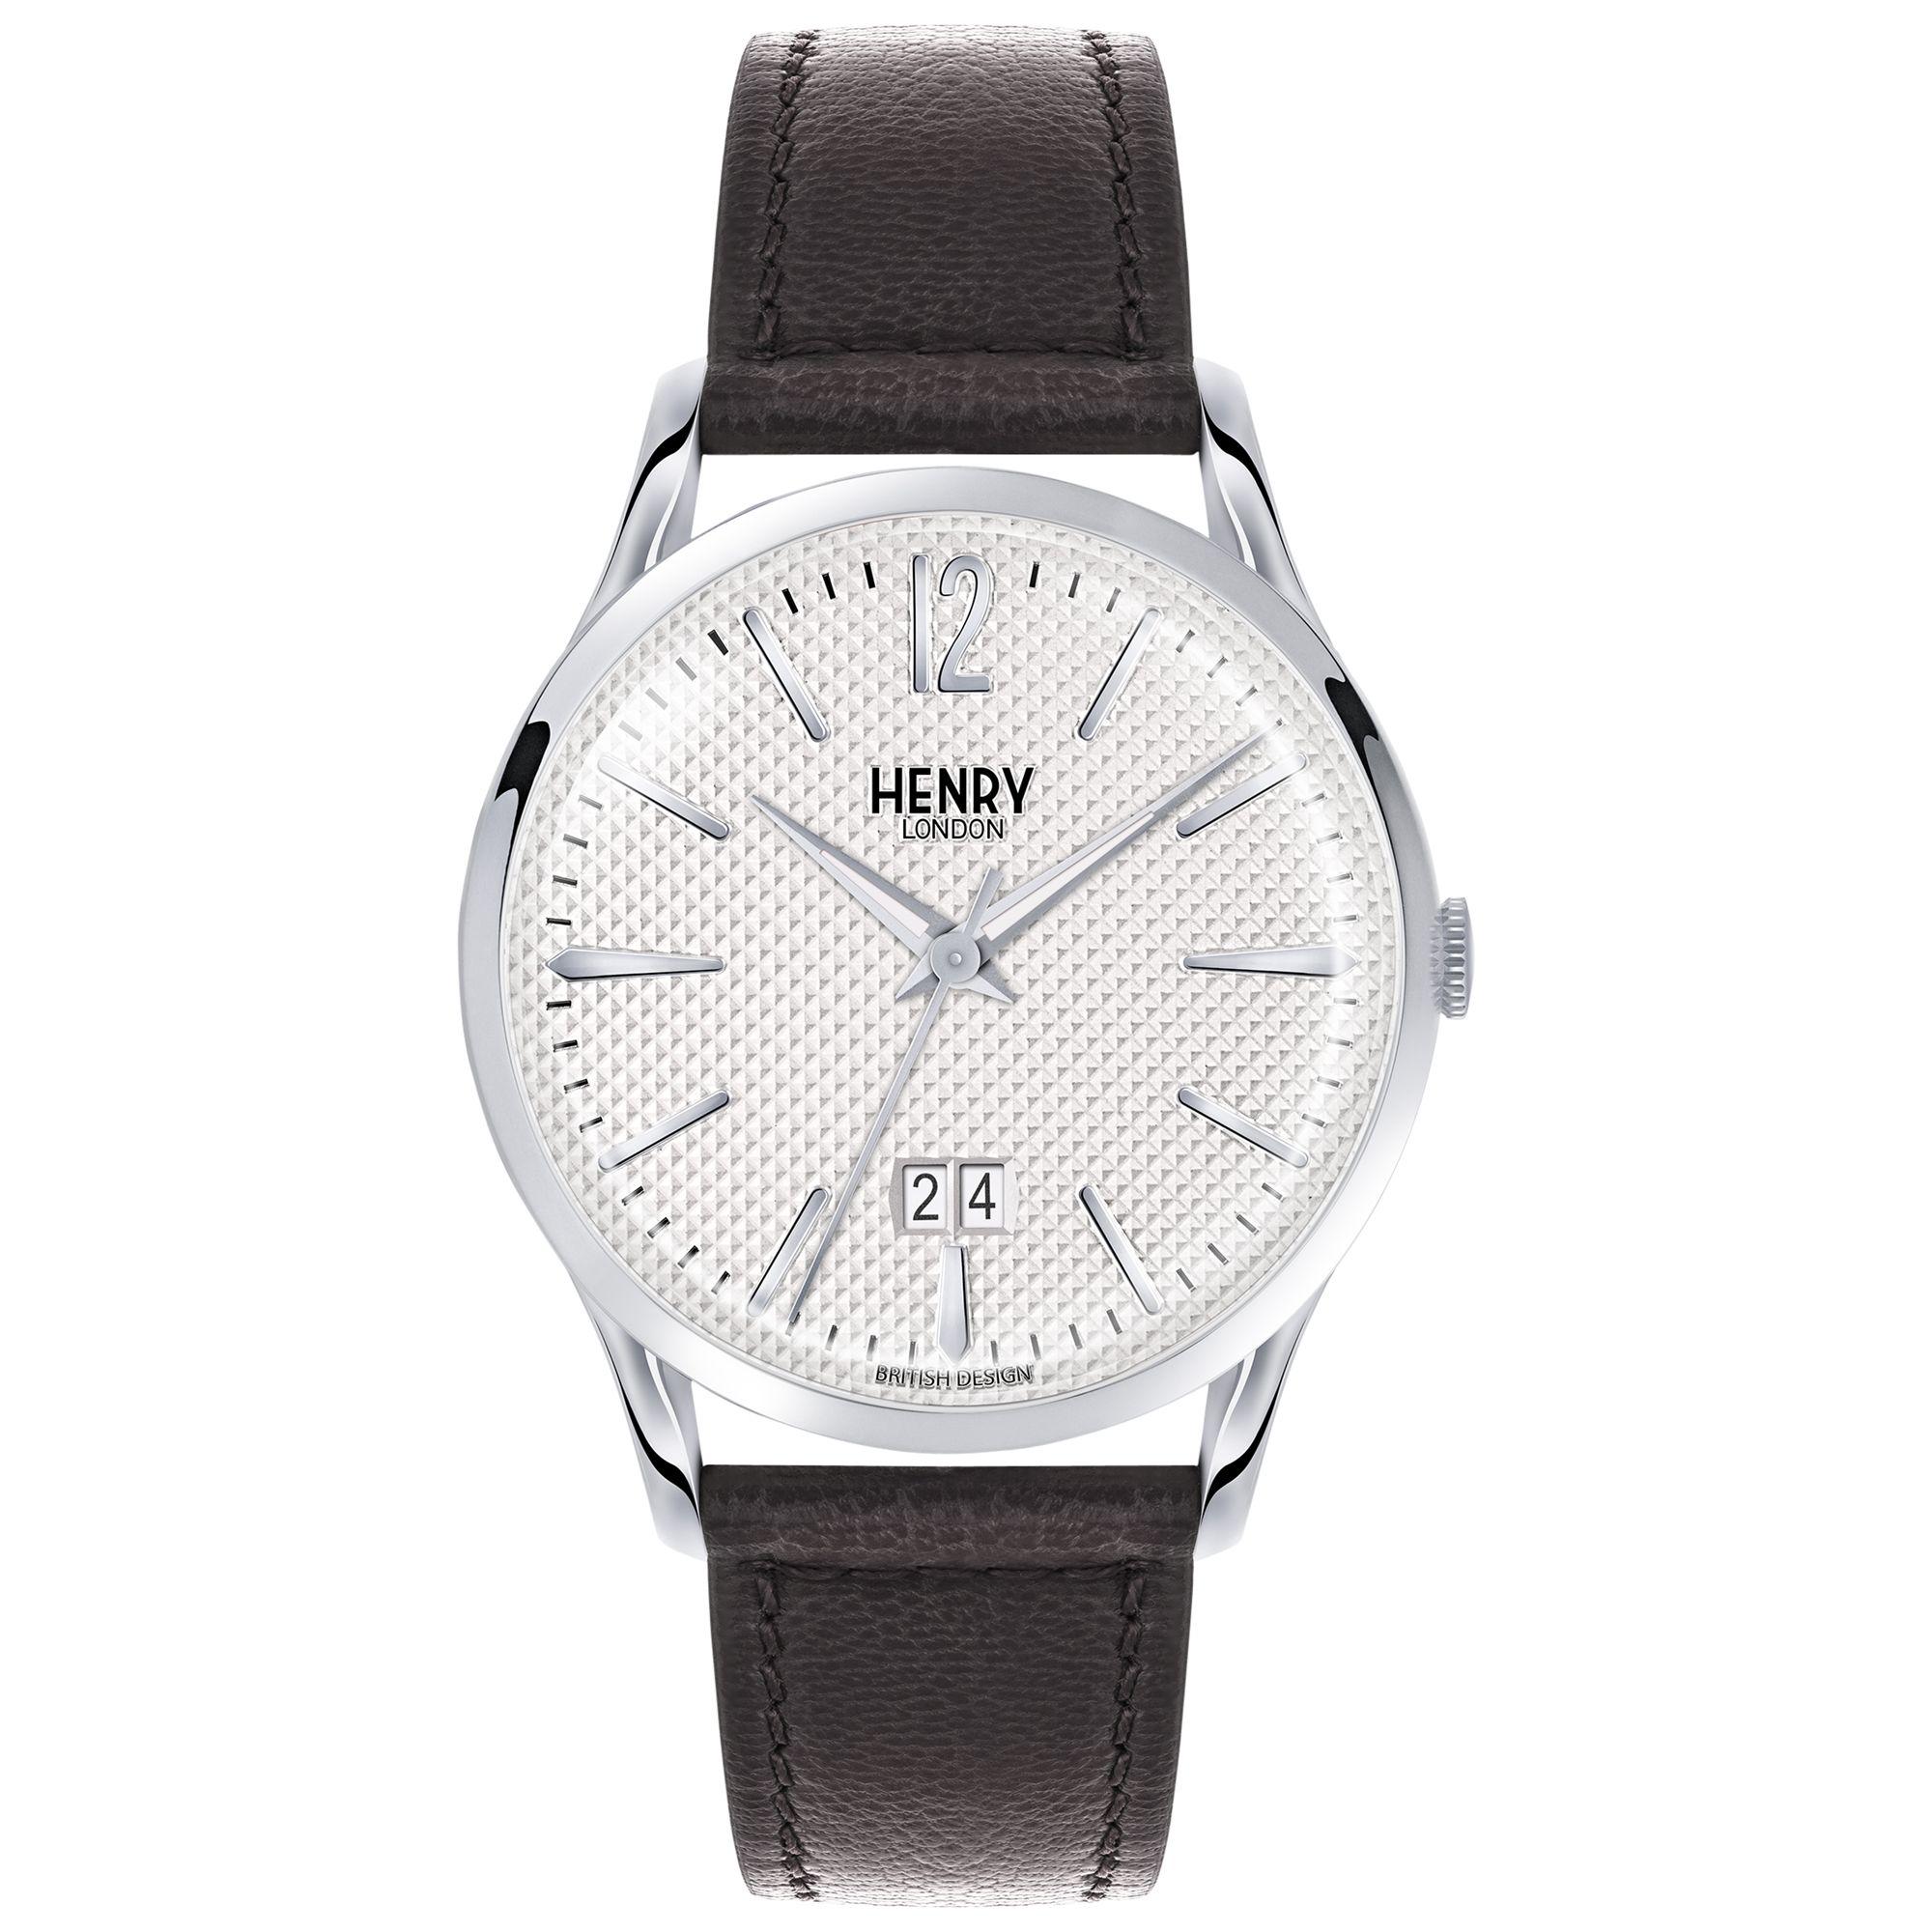 Henry London Henry London HL41-JS-0021 Men's Edgware Jumbo Date Leather Strap Watch, Black/White